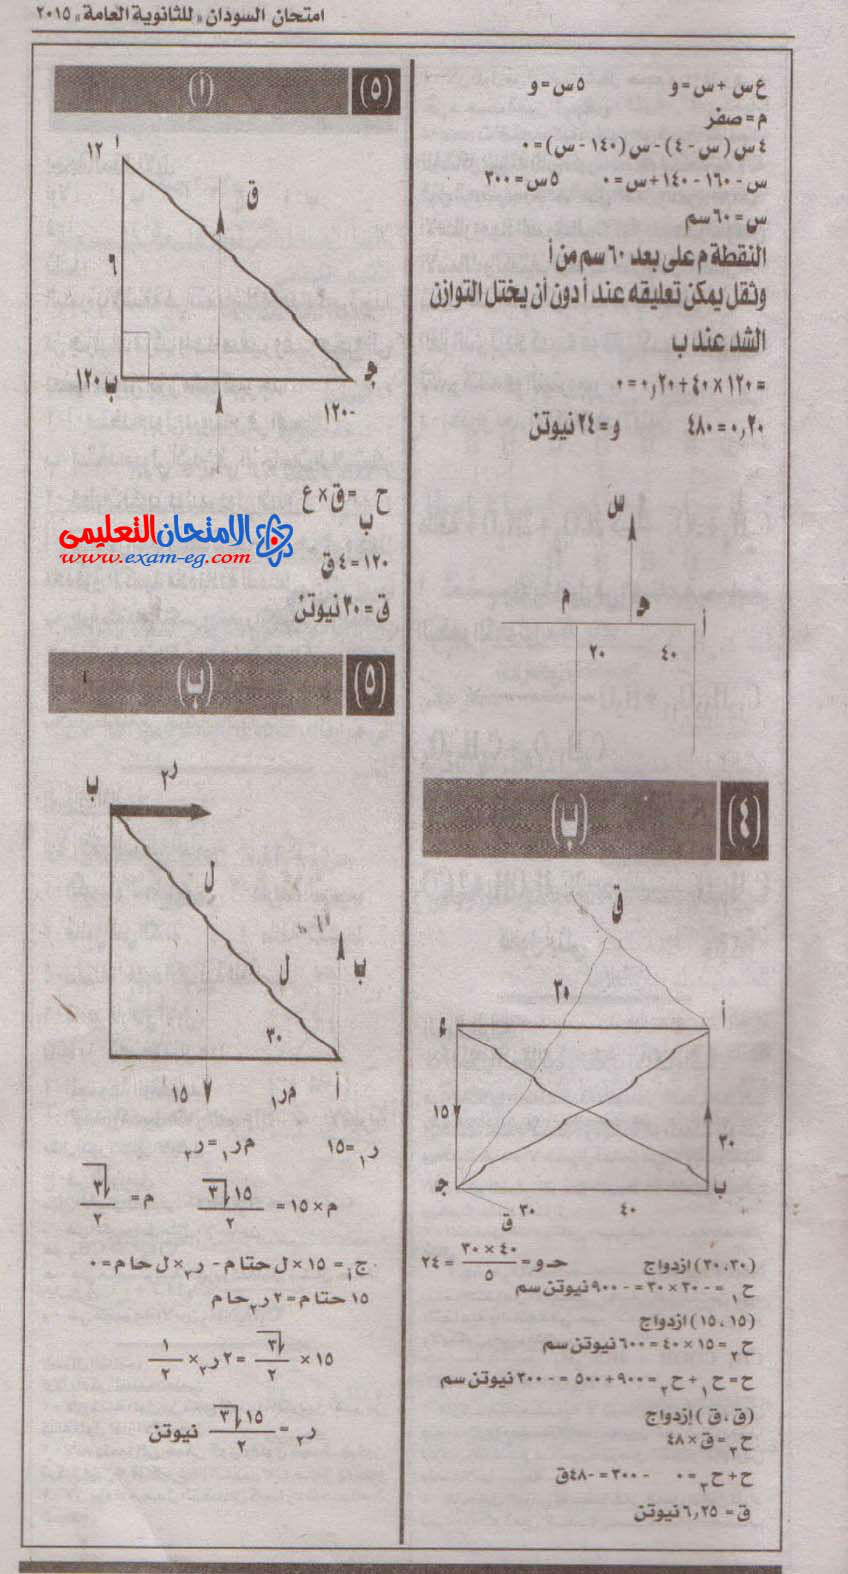 exam-eg.com_1429847573375.jpg